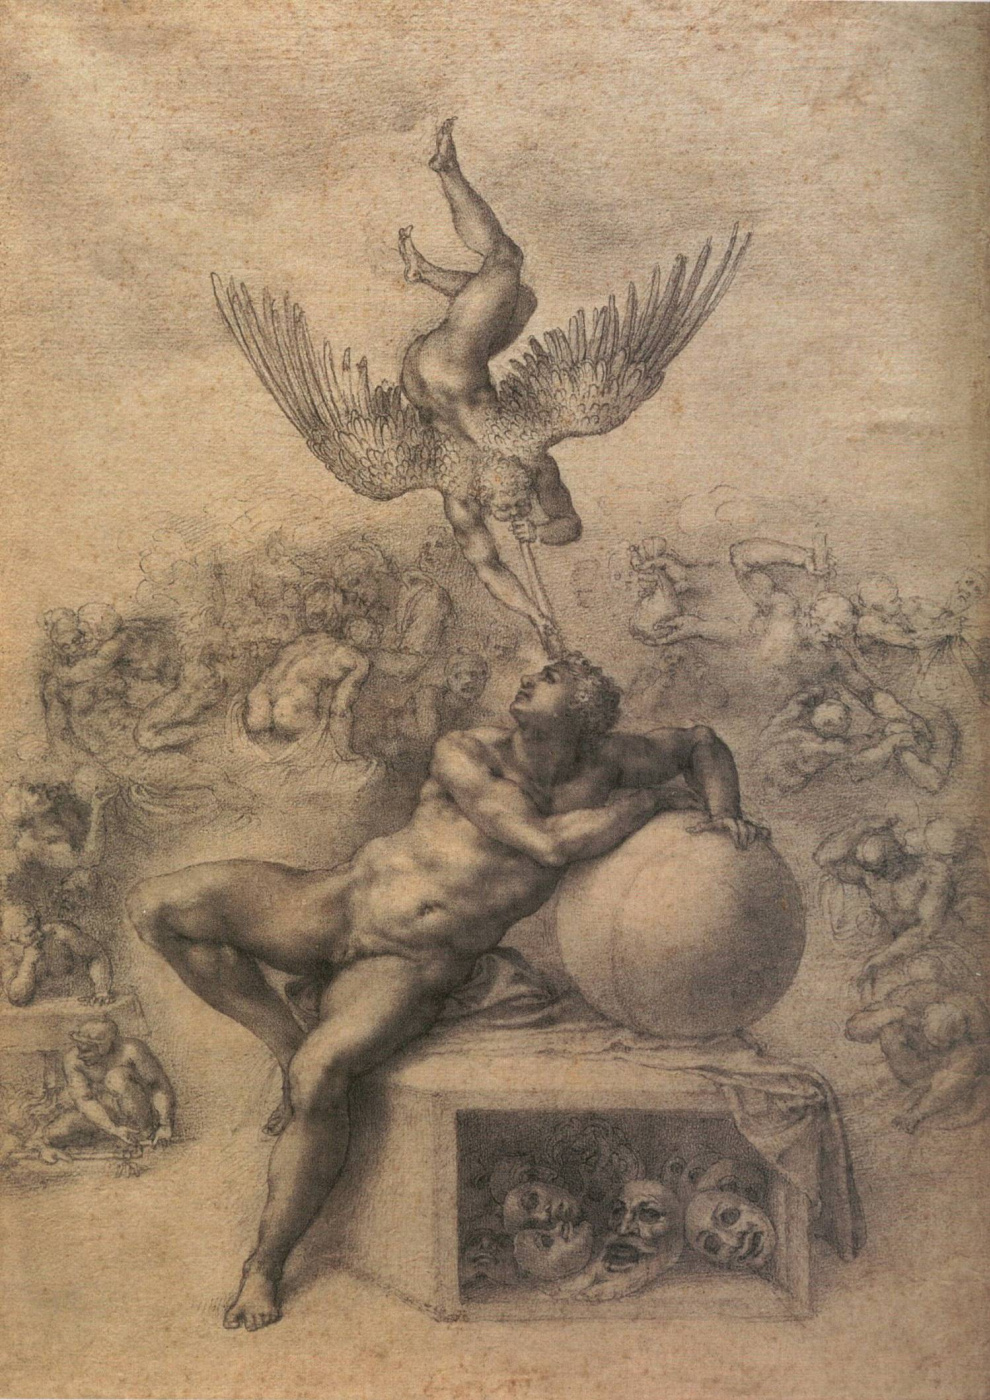 Michelangelo Buonarroti. The dream of human life